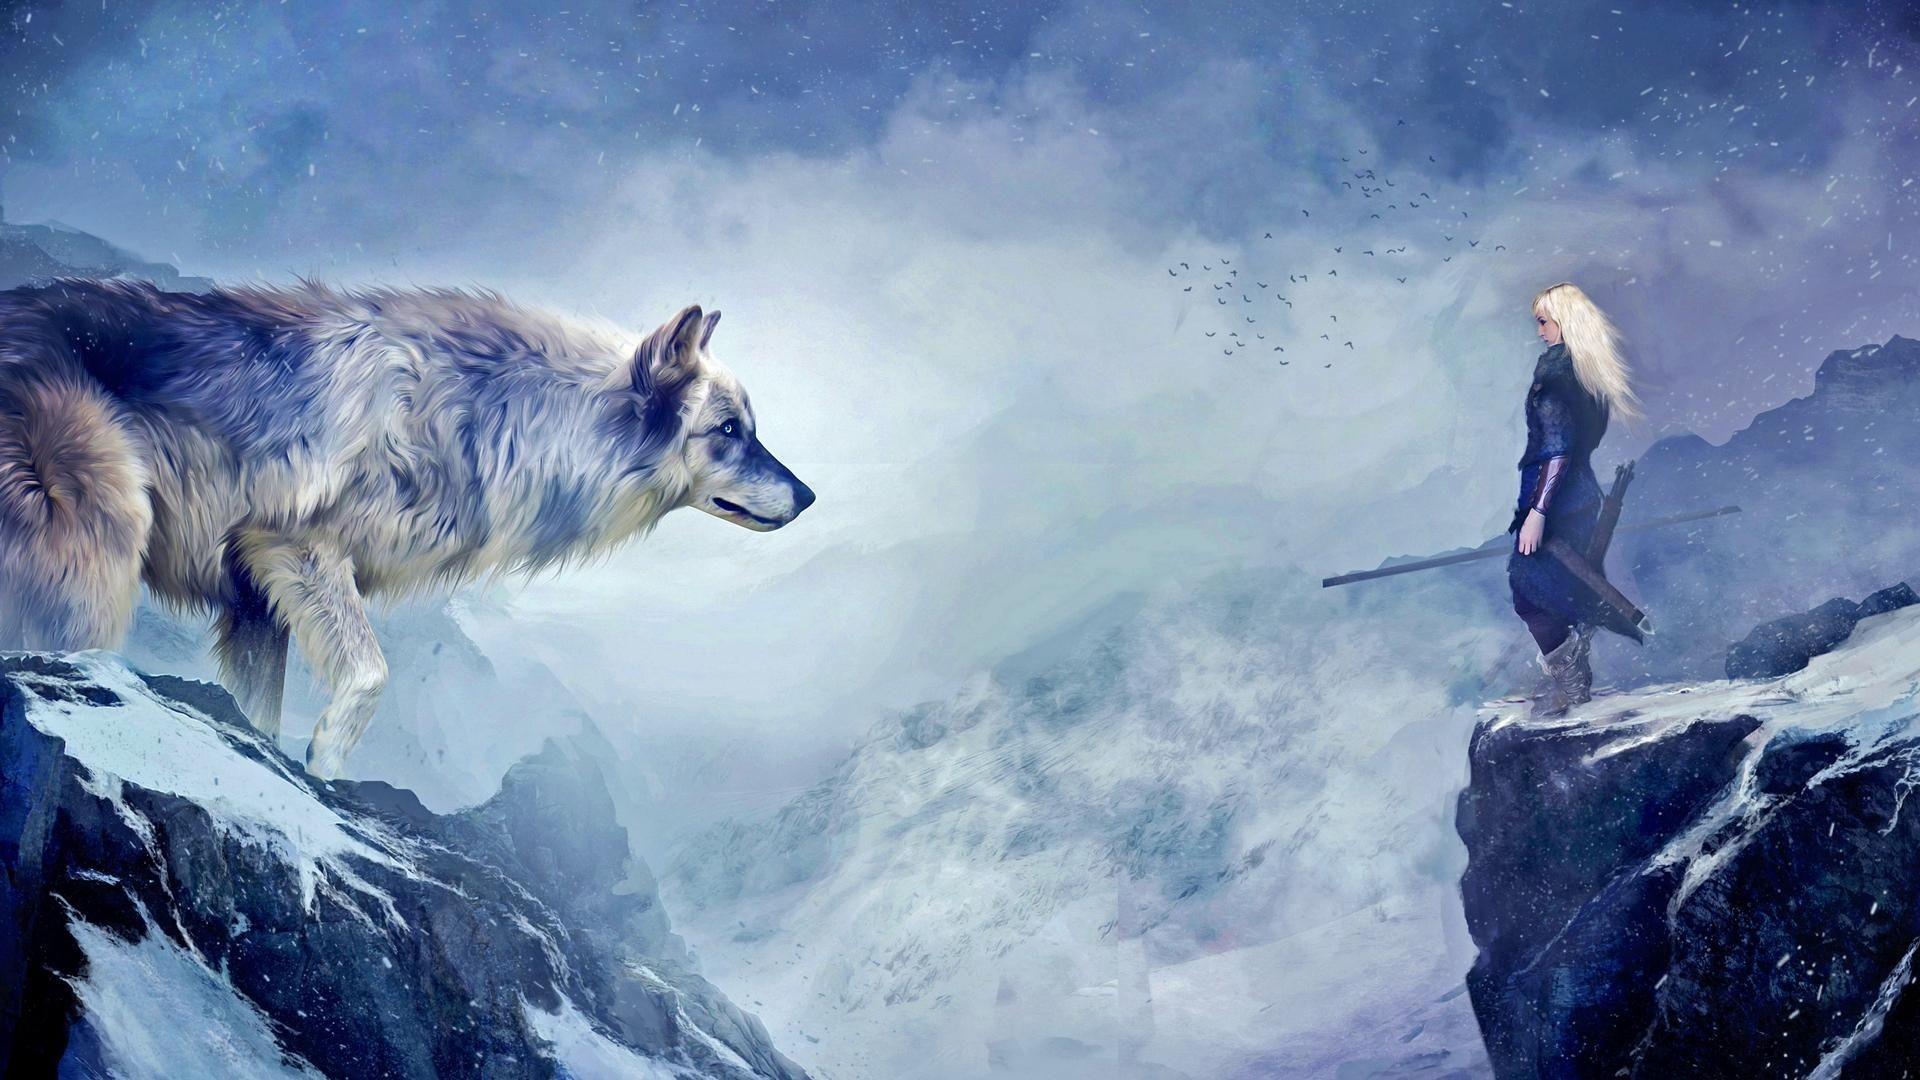 Fantasy Wolf Fantasy Woman Warrior Woman Mountain White Hair Wallpaper Wolf Wallpaper Fantasy Wolf Winter Wolves